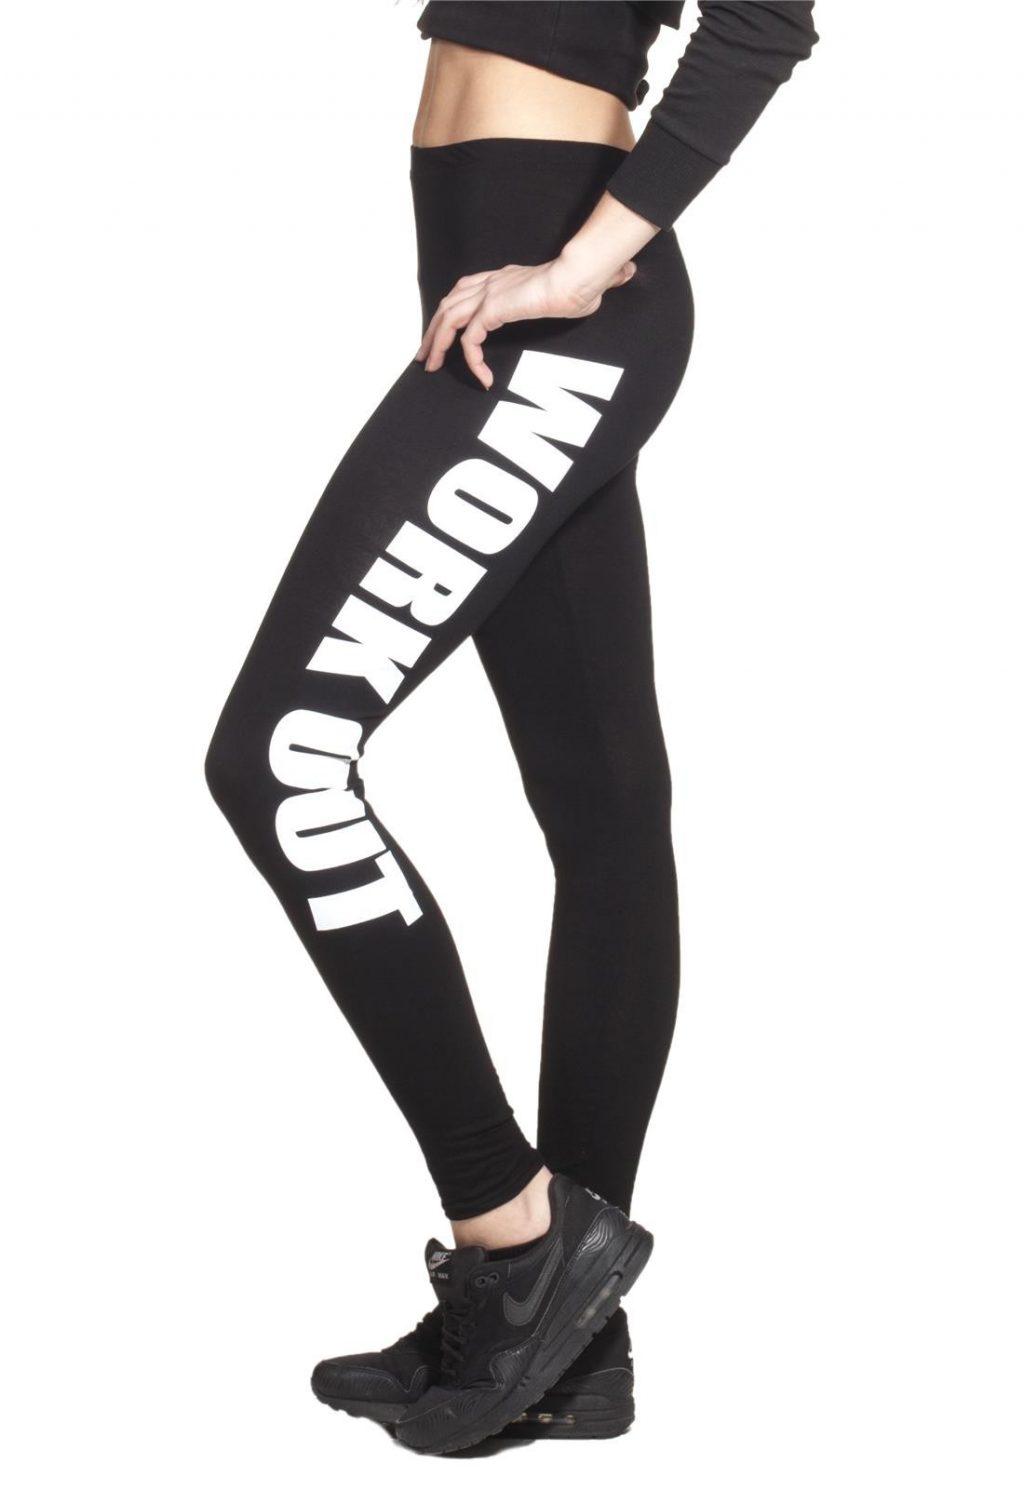 workout-leggigns-